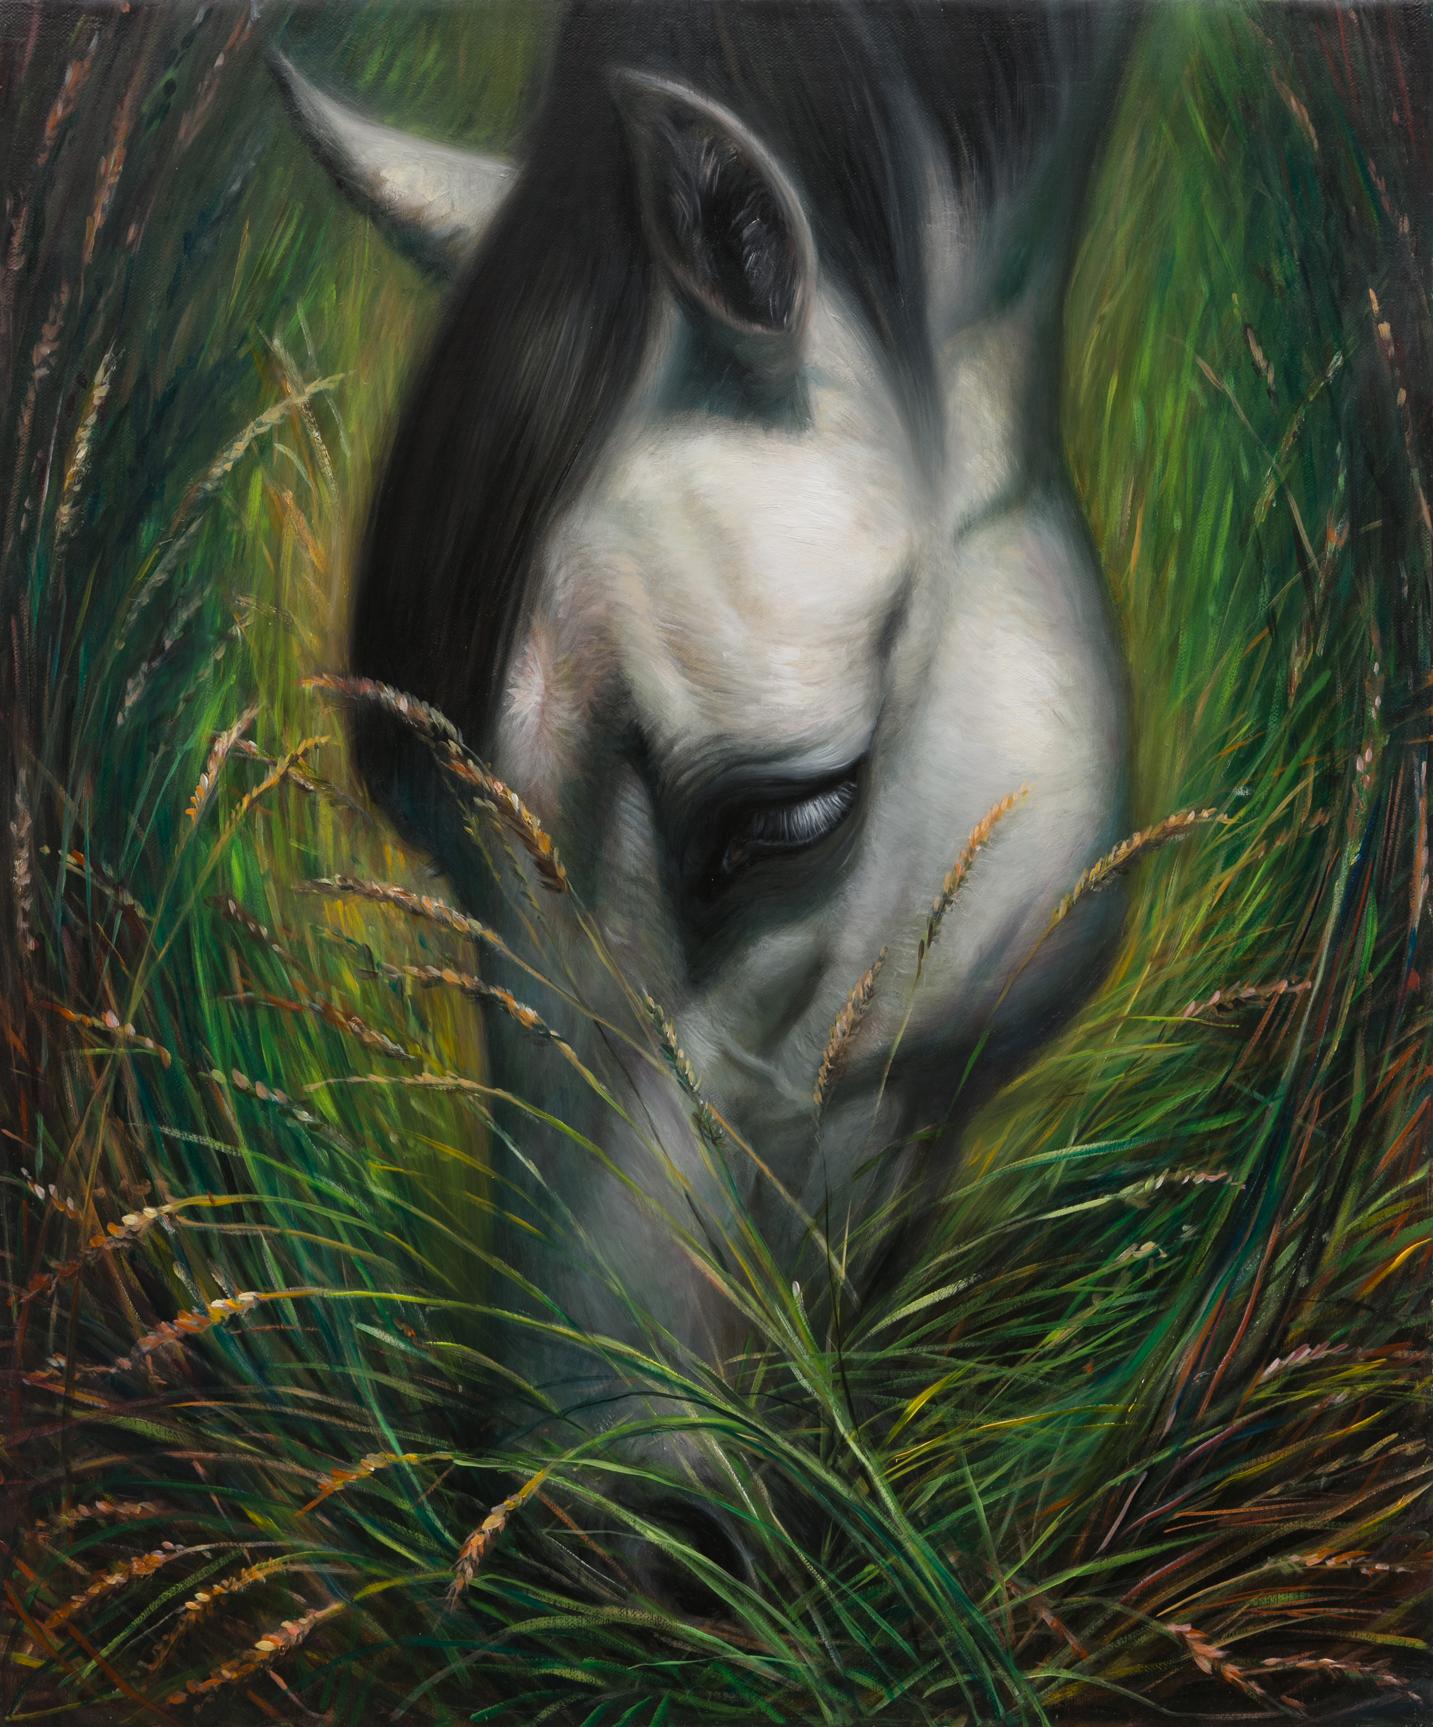 TM Davy   horse (xooo)  2016 Oil on linen 61 x 51 cm